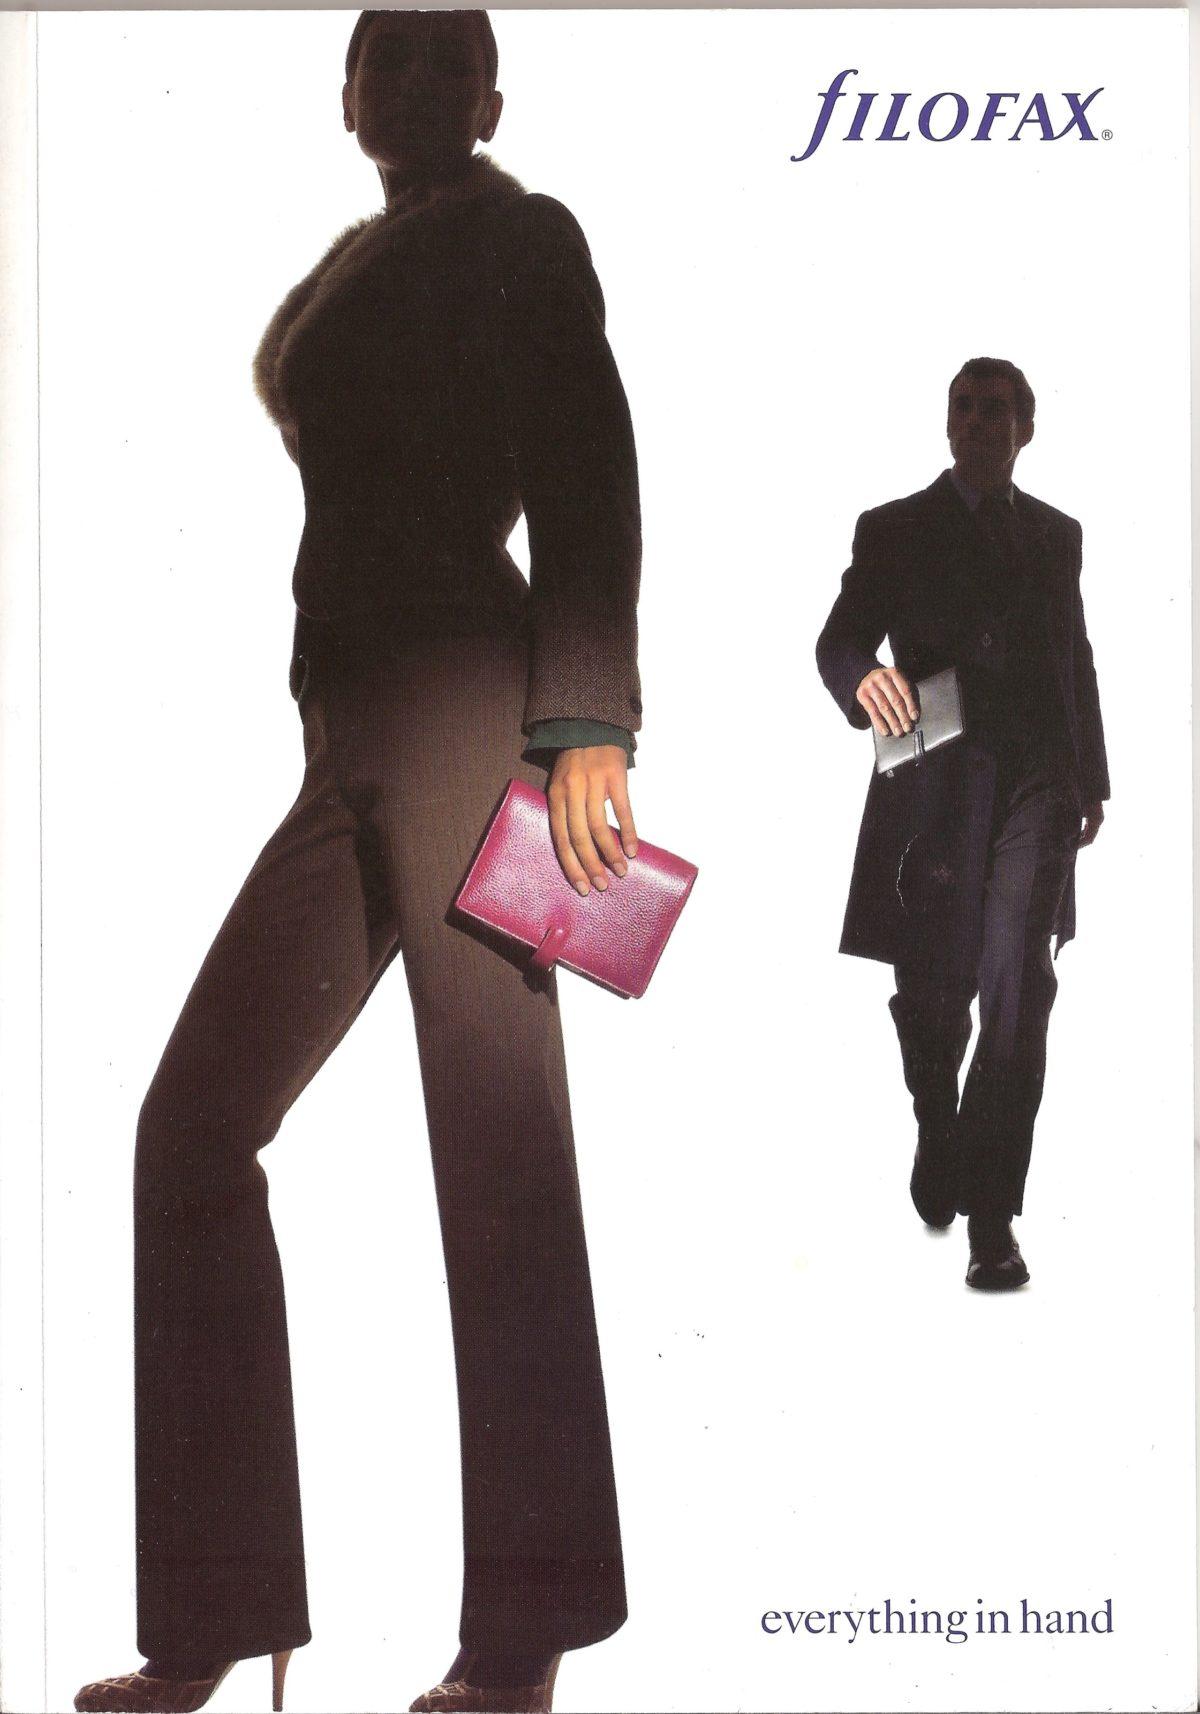 Filofax UK Full Catalogue2005/6